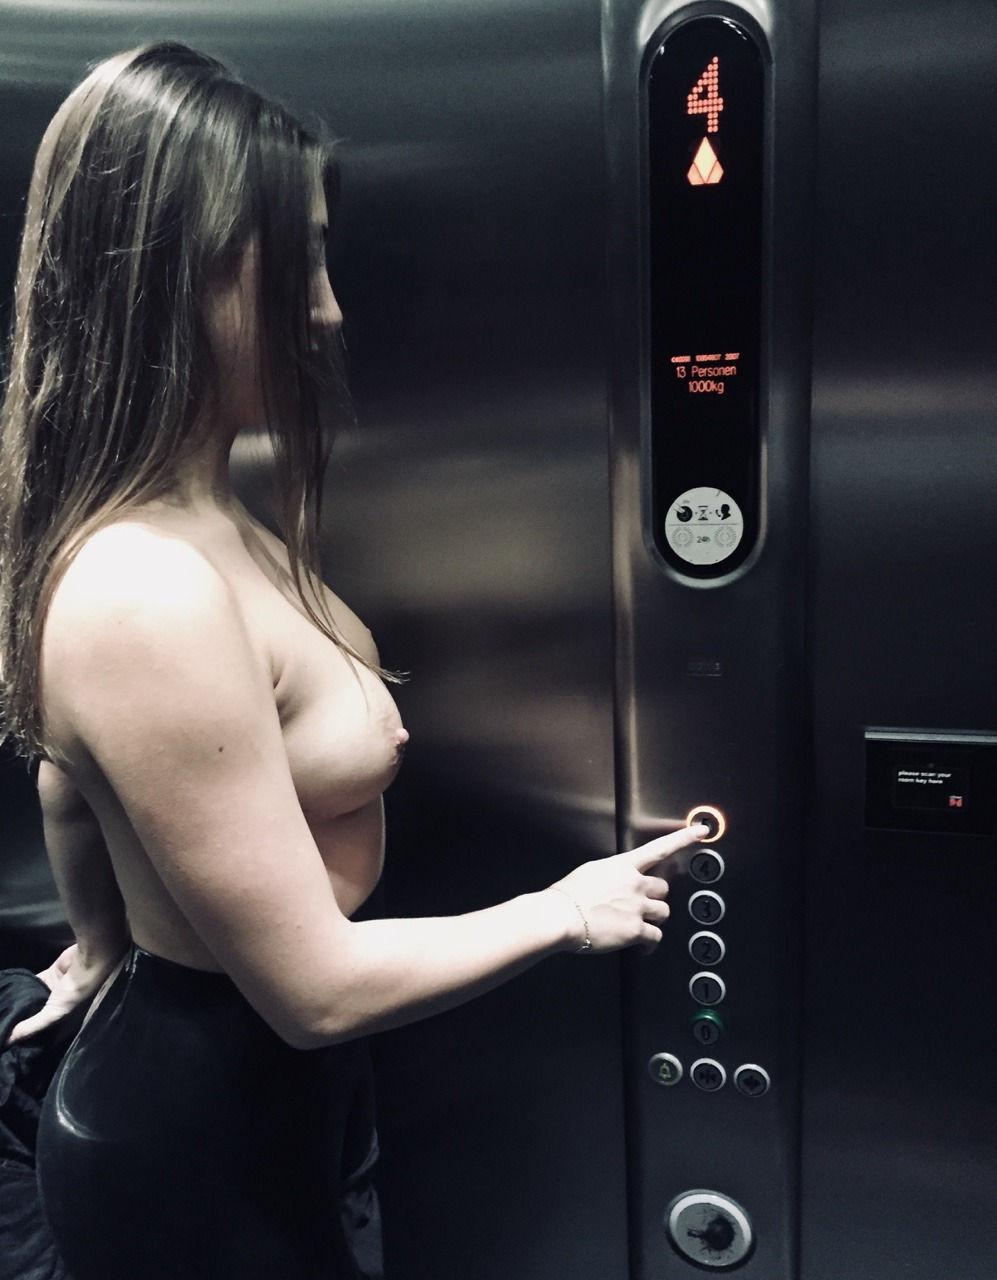 Flashing in a hotel elevator..nice! 😉